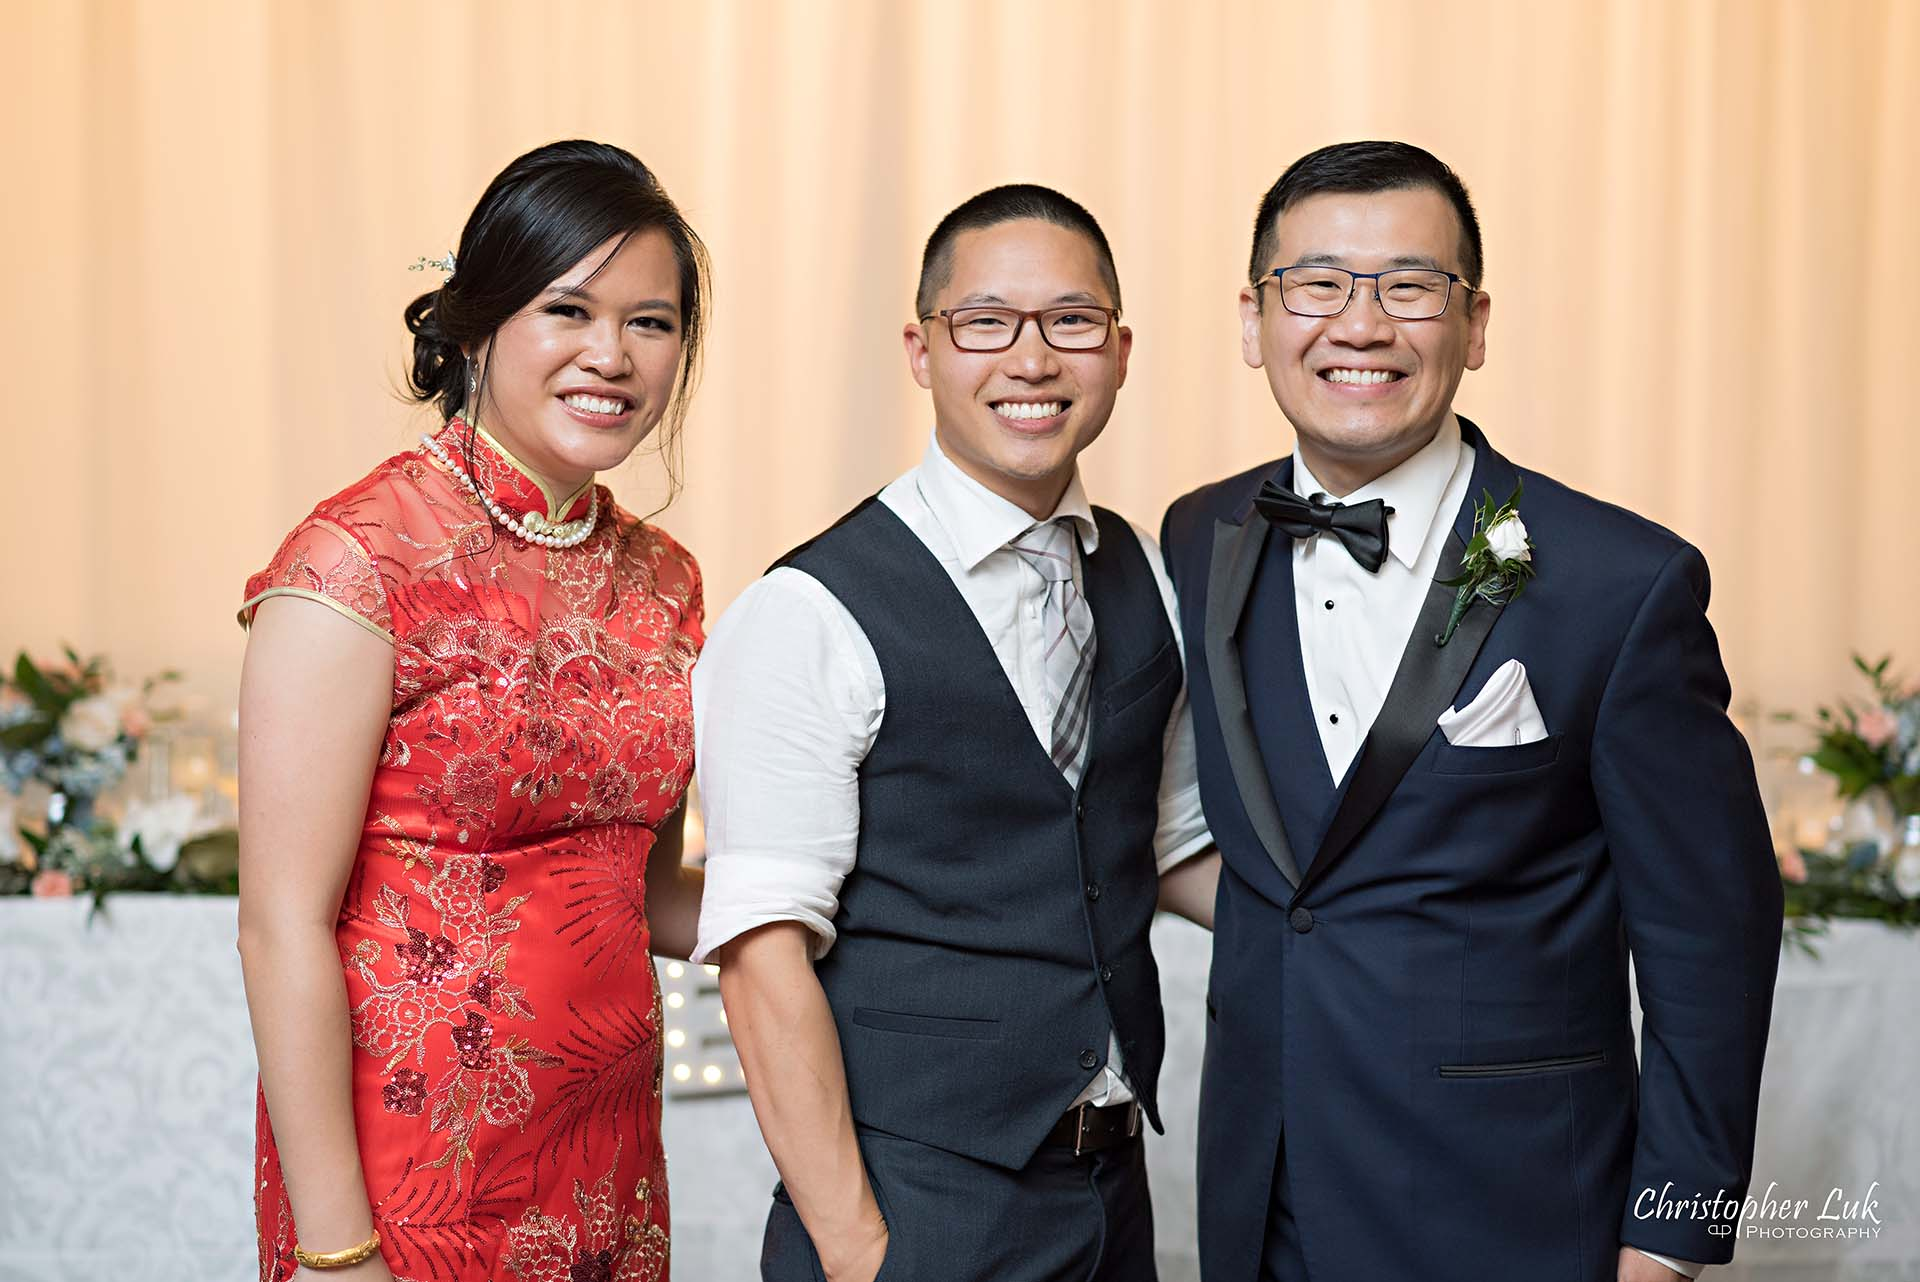 Christopher Luk Toronto Kleinburg Presidente Banquet Hall Vaughan Wedding Photographer Bride Groom